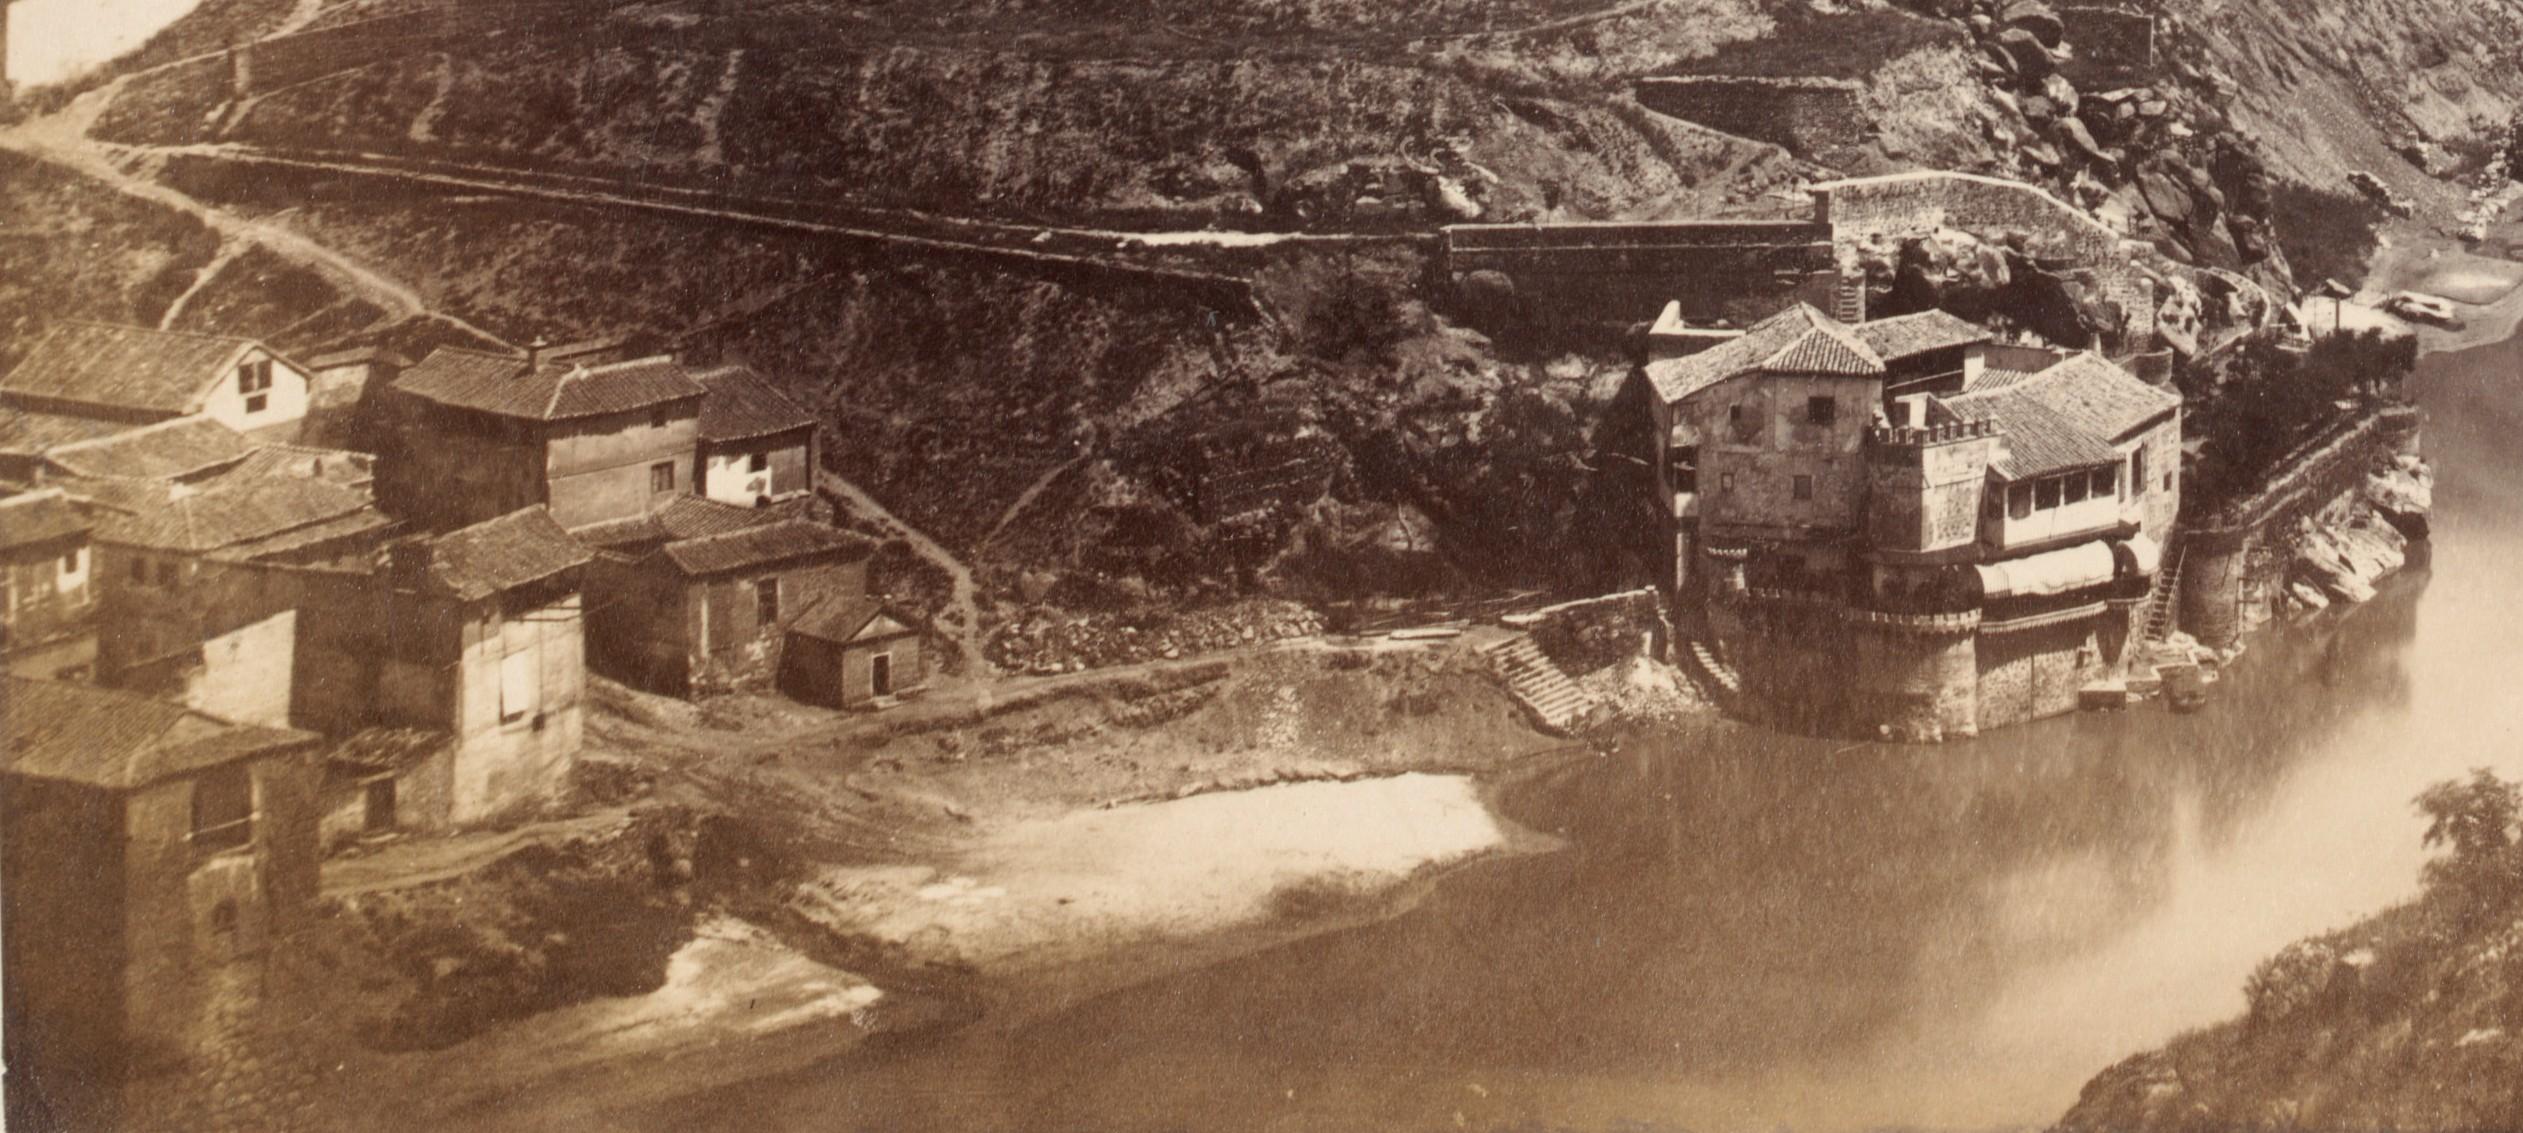 Torre del Hierro de Toledo en 1857. Foto Charles Clifford (detalle)